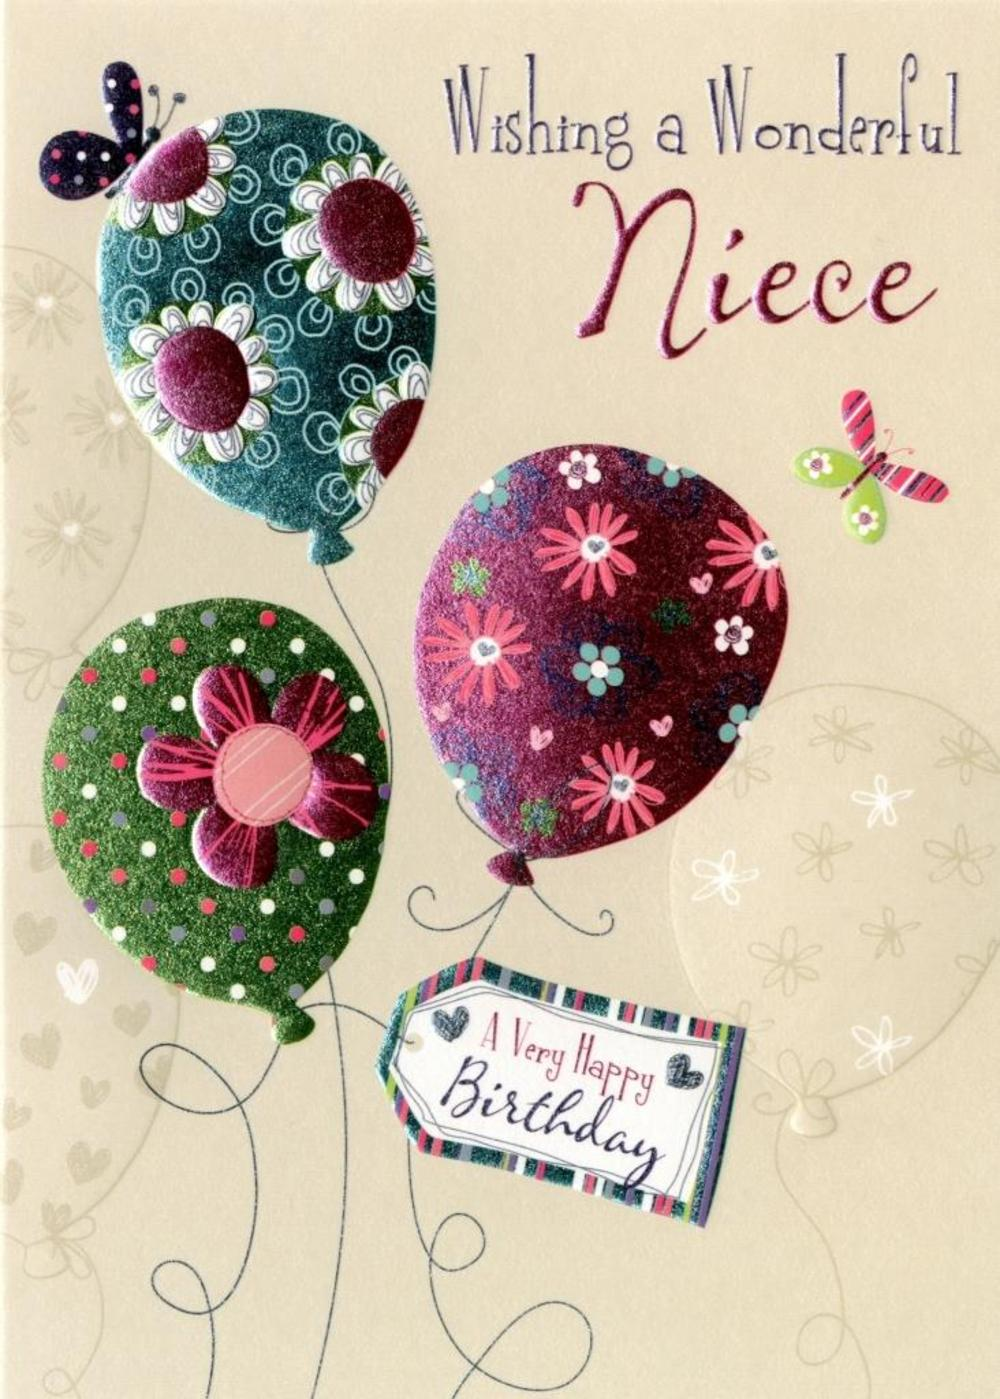 Wonderful Niece Birthday Greeting Card